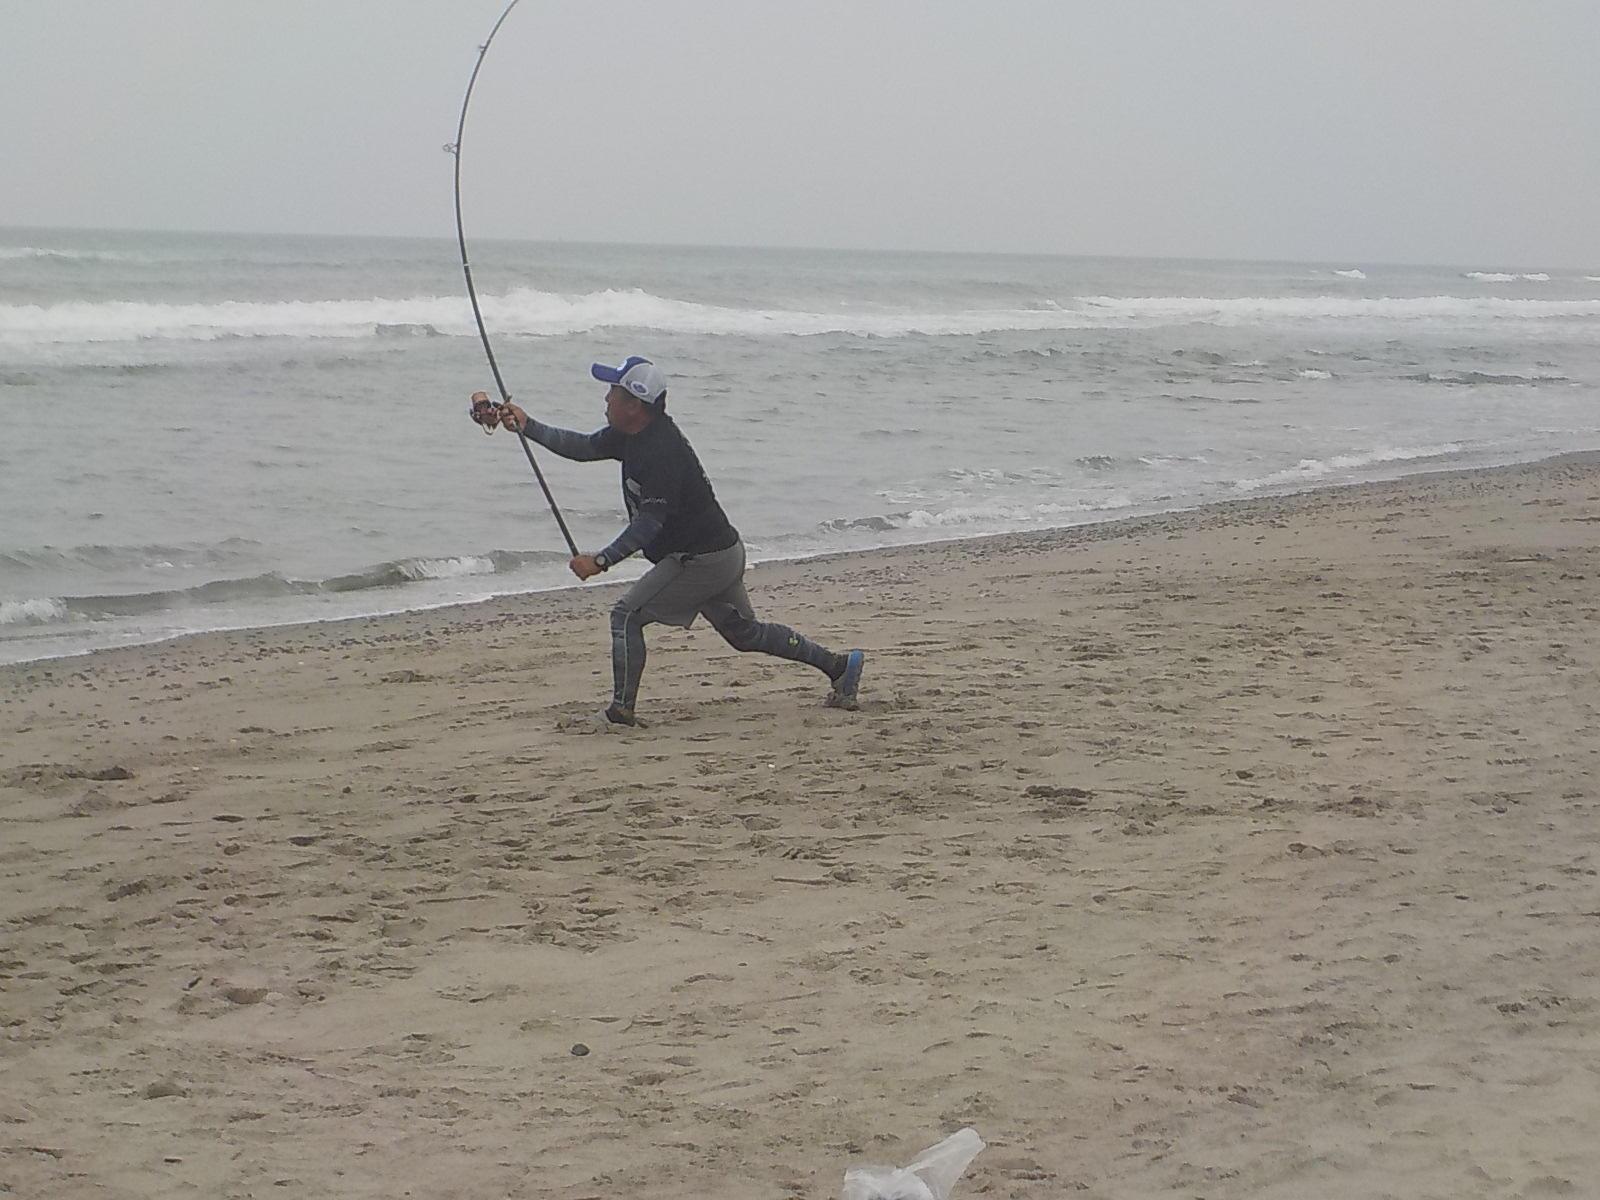 静岡 釣り風景1.JPG